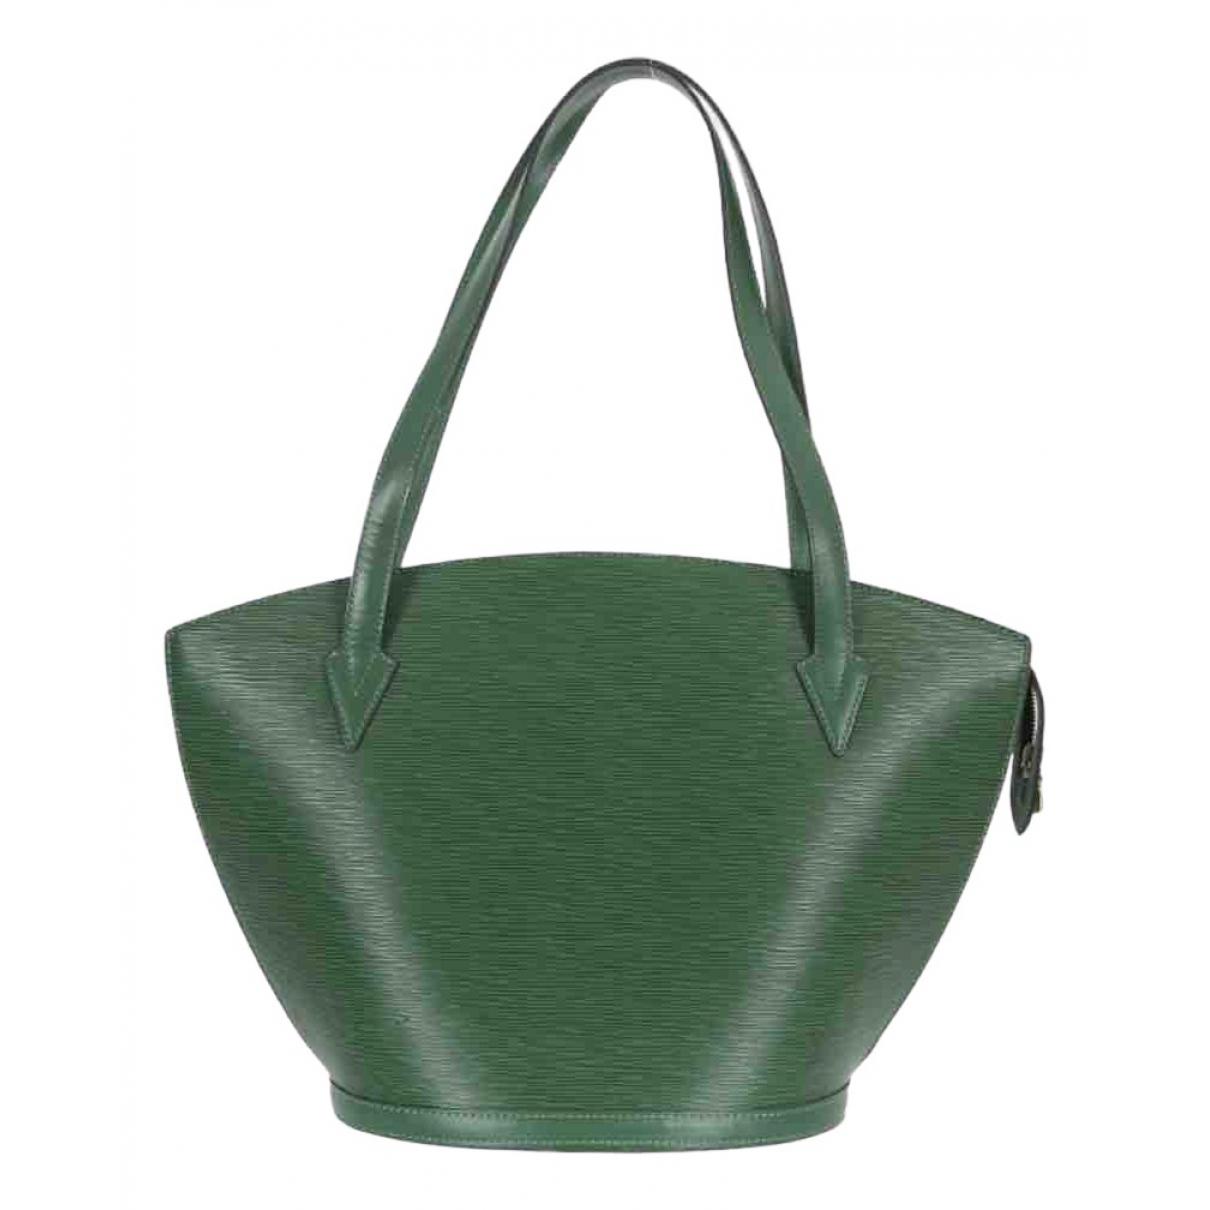 Louis Vuitton Saint Jacques Handtasche in  Gruen Leder